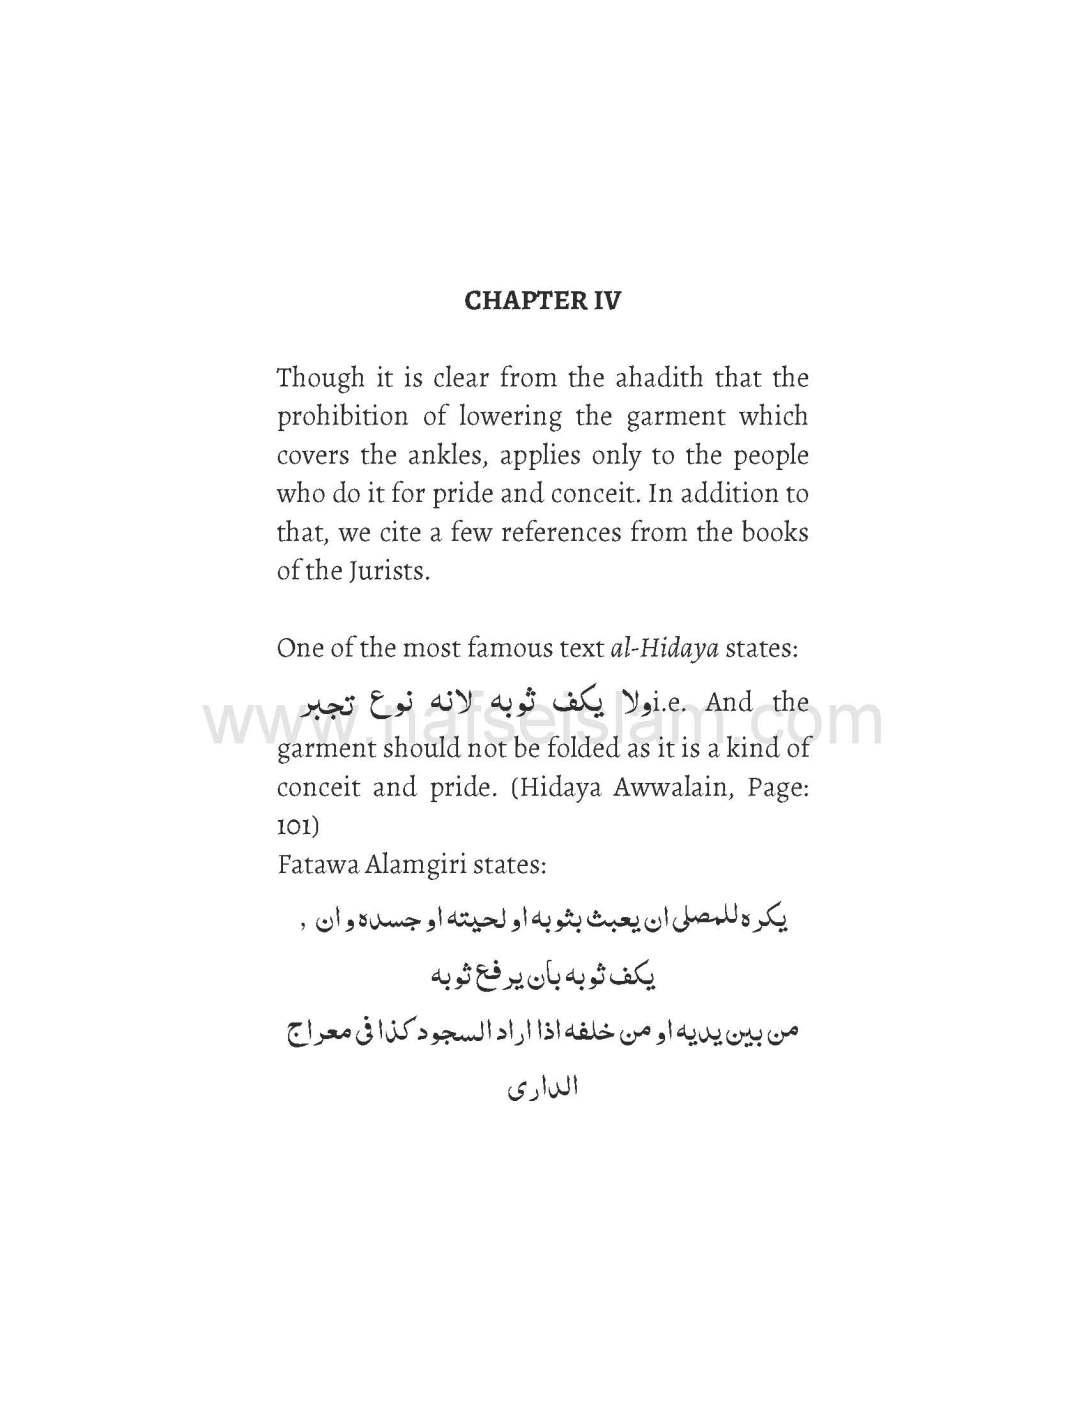 Islamic Ruling On Folding Pants In Salah_Page_20